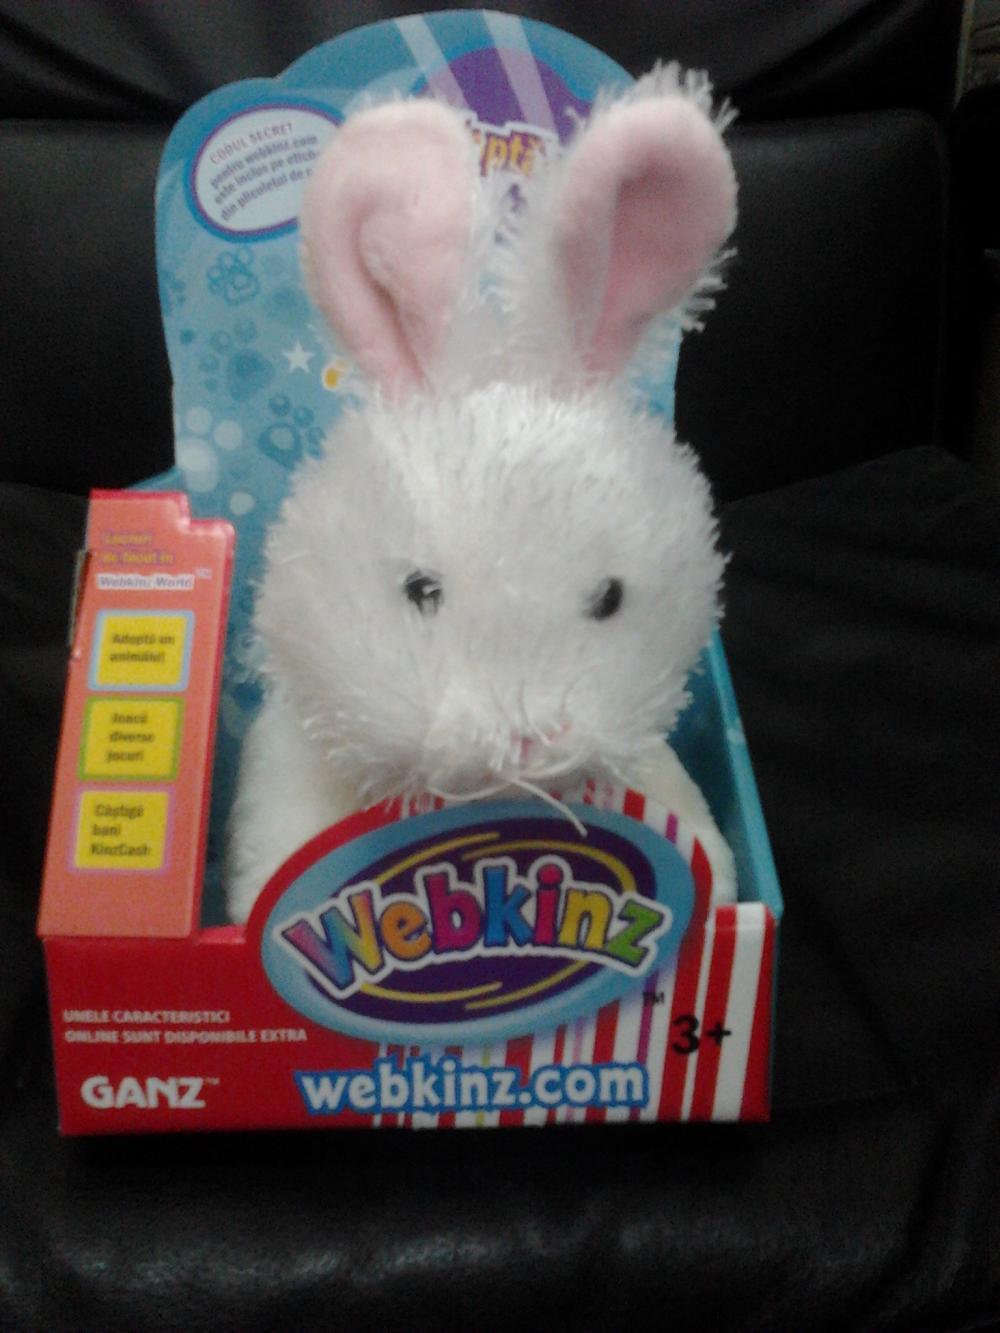 Plus Webkinz cutie